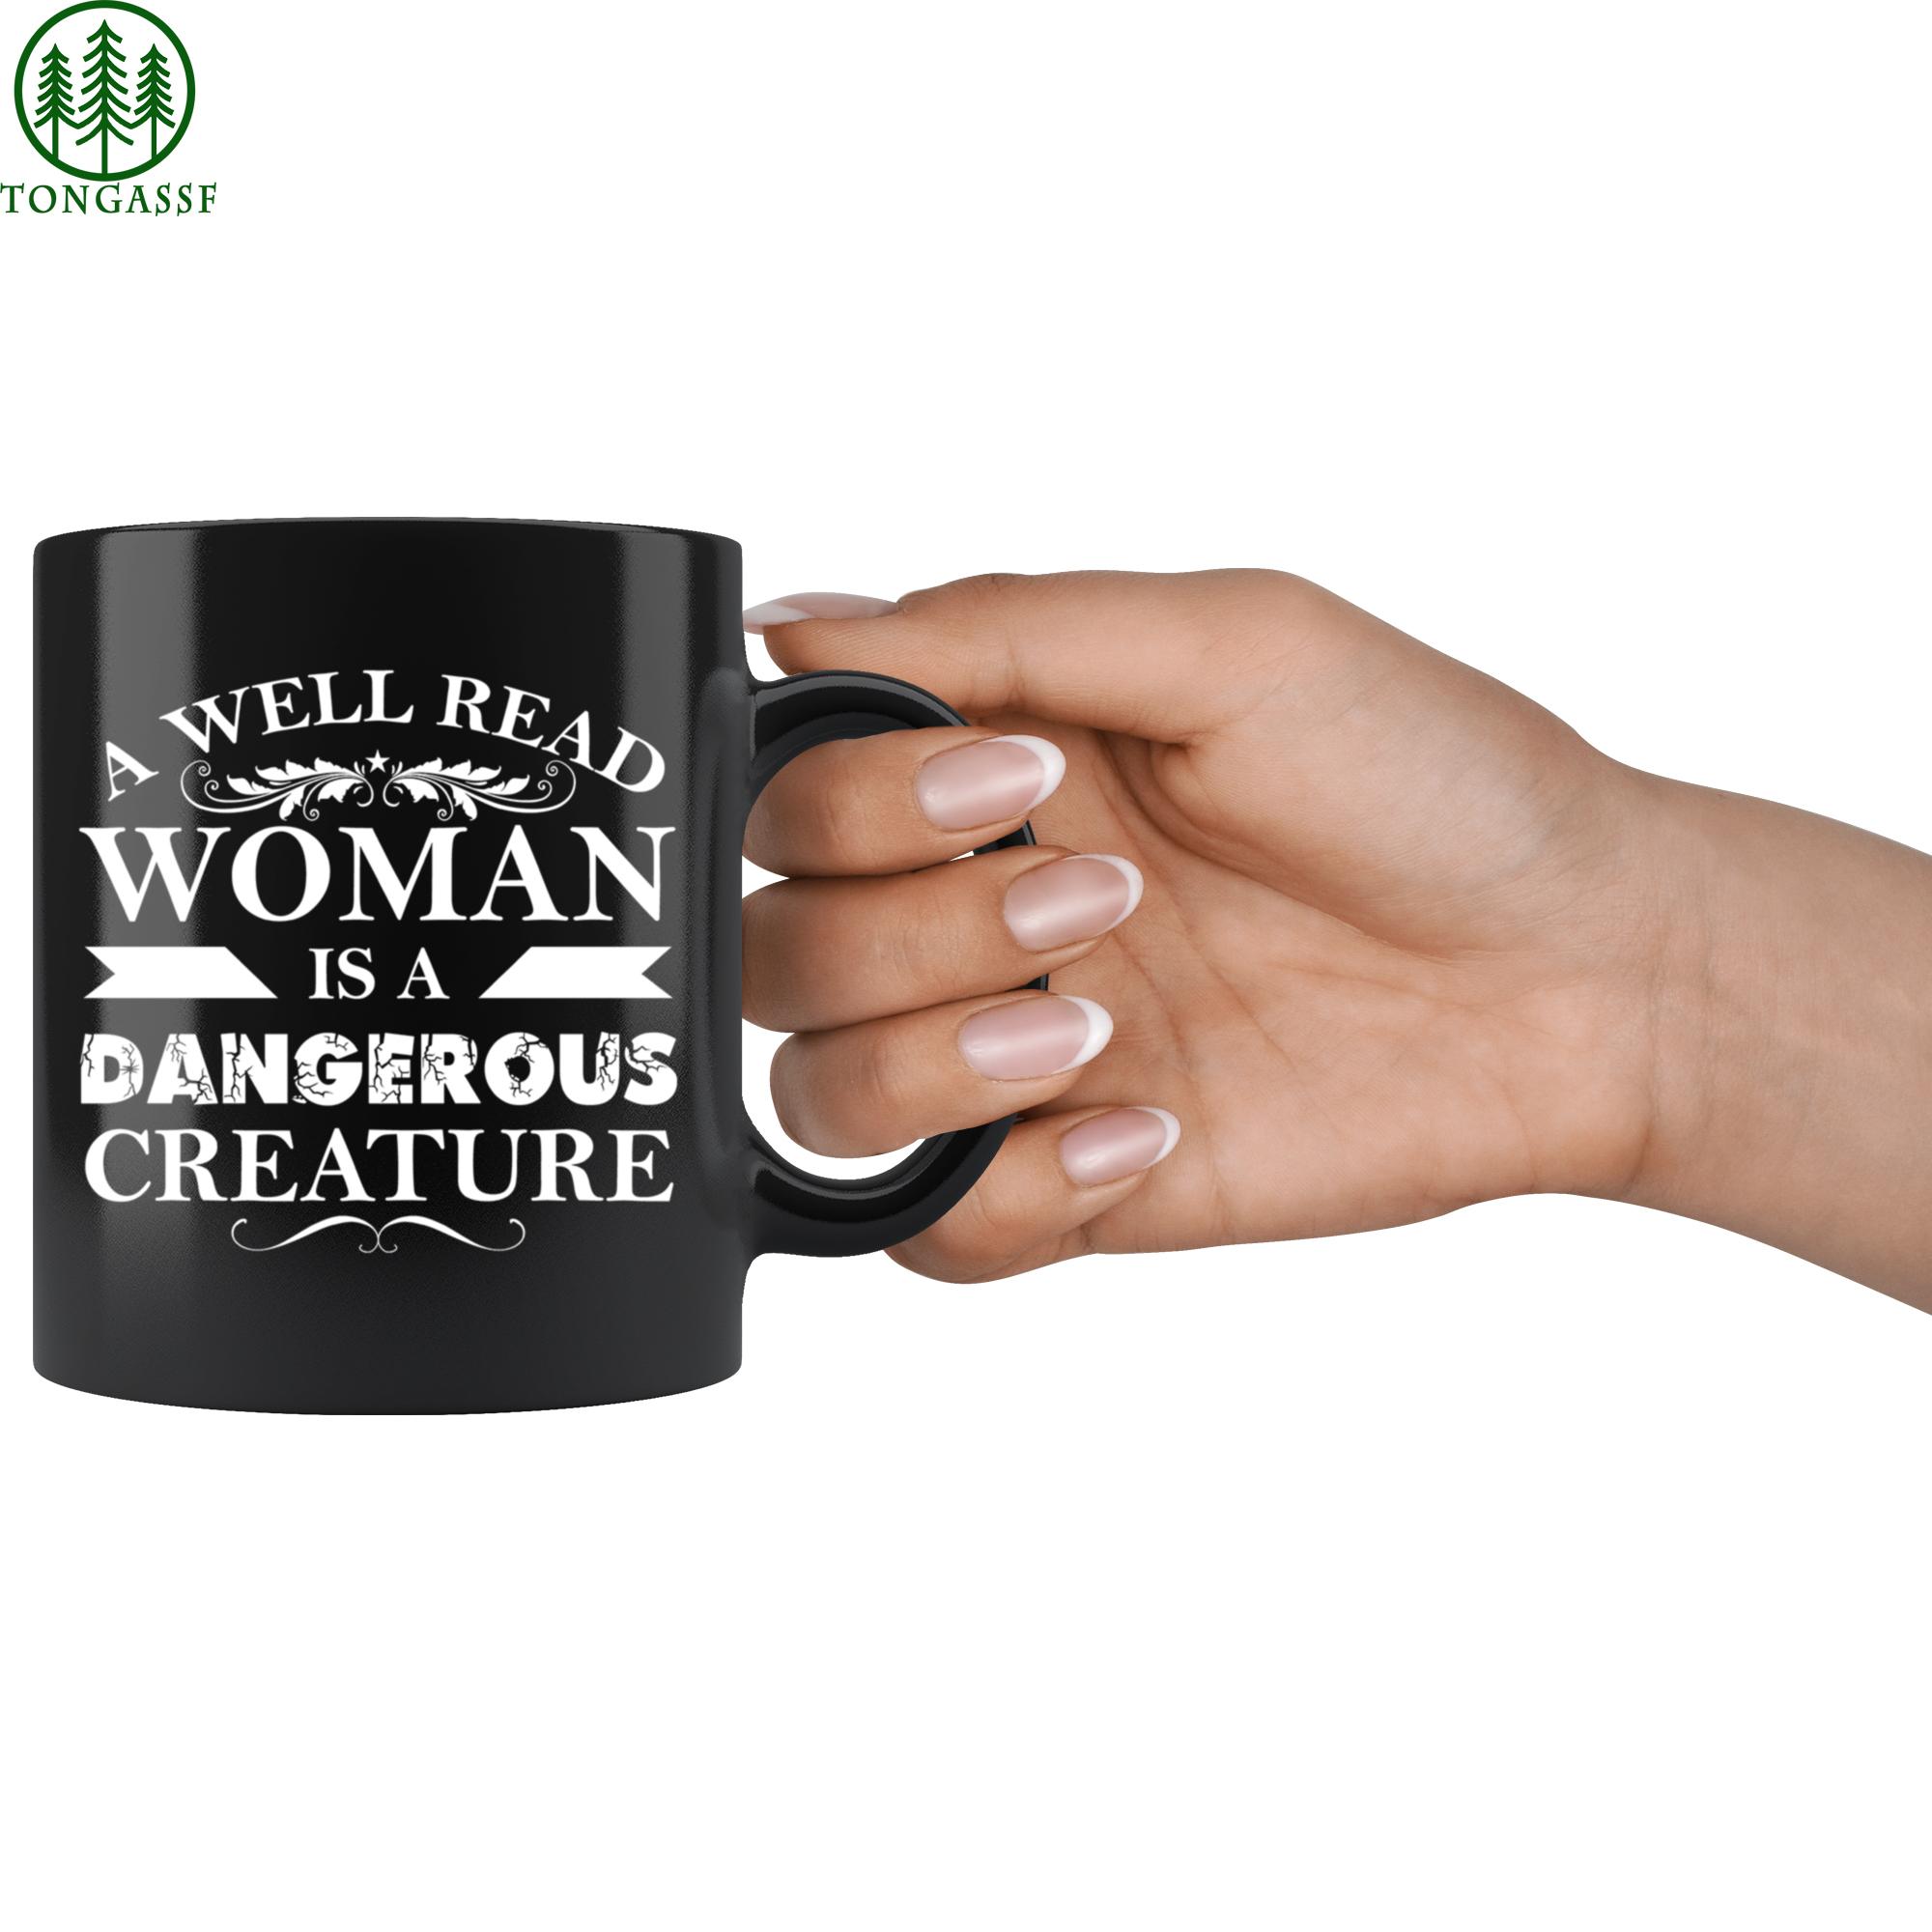 Hot Well Read Woman like Creature Black ceramic Mug